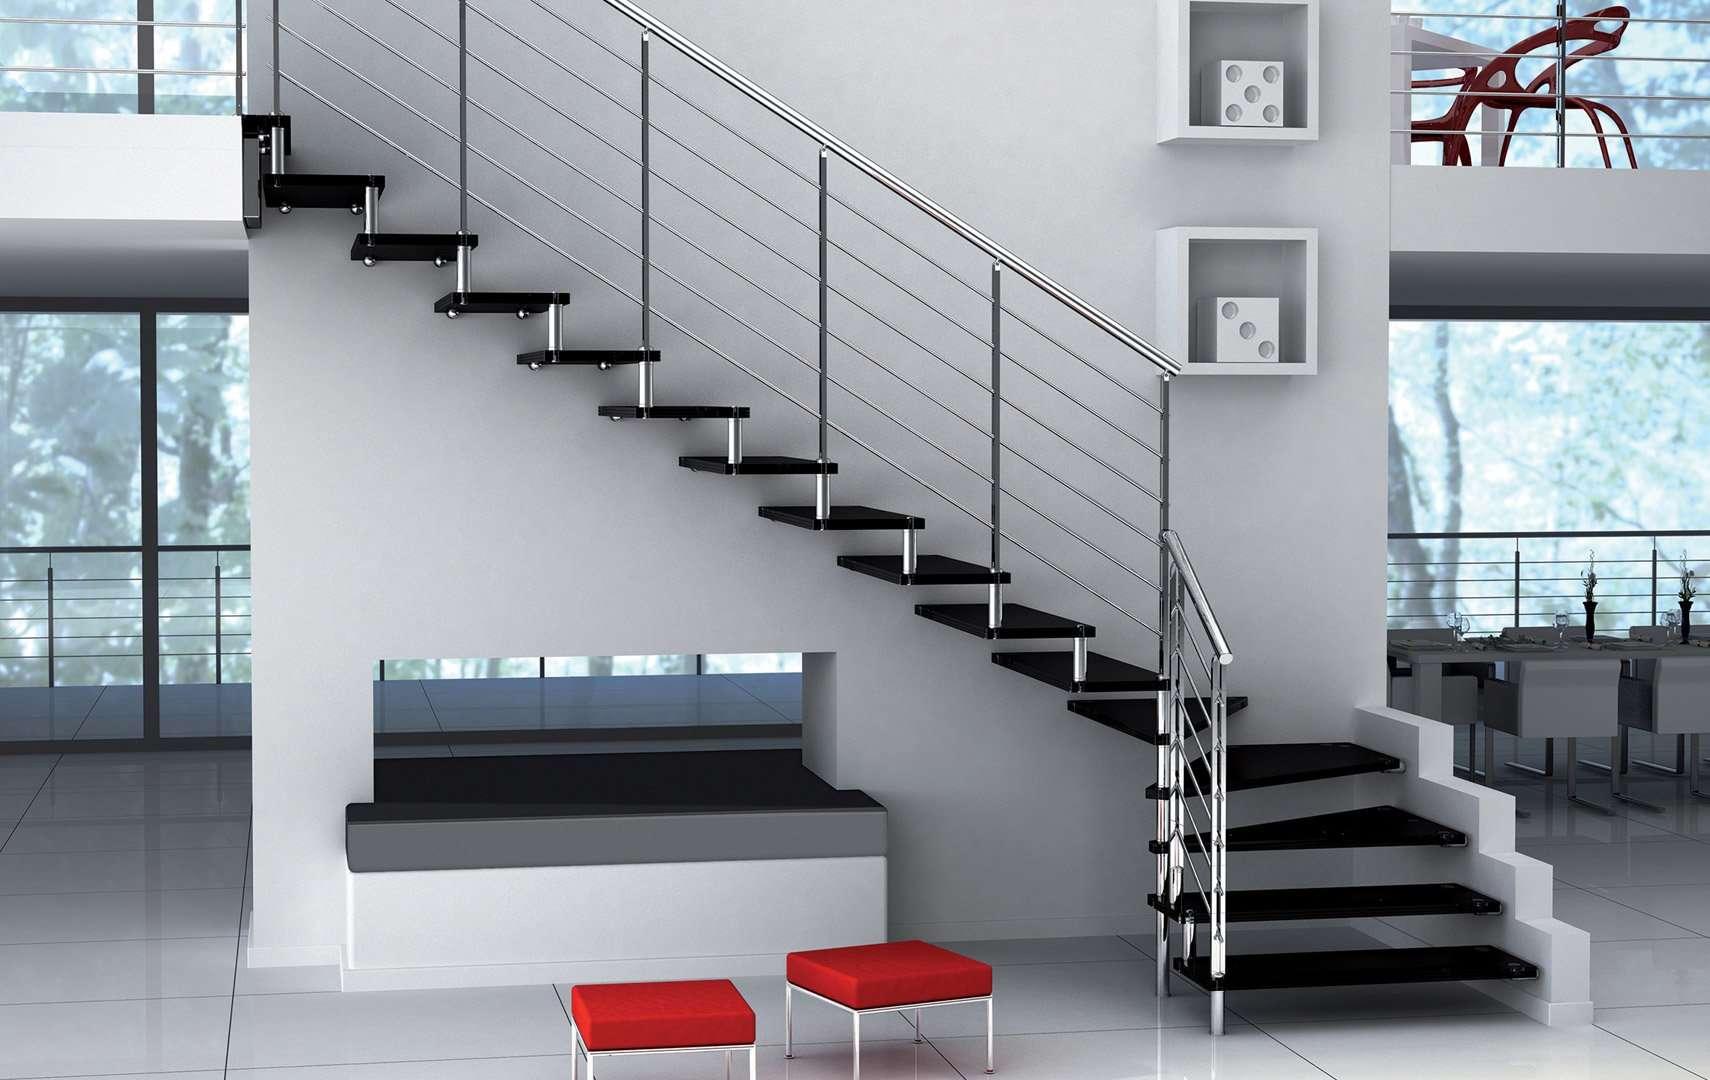 escaleras de medidas escaleras modernas escaleras escaleras rectas escaleras interiores escaleras para interiores escaleras de